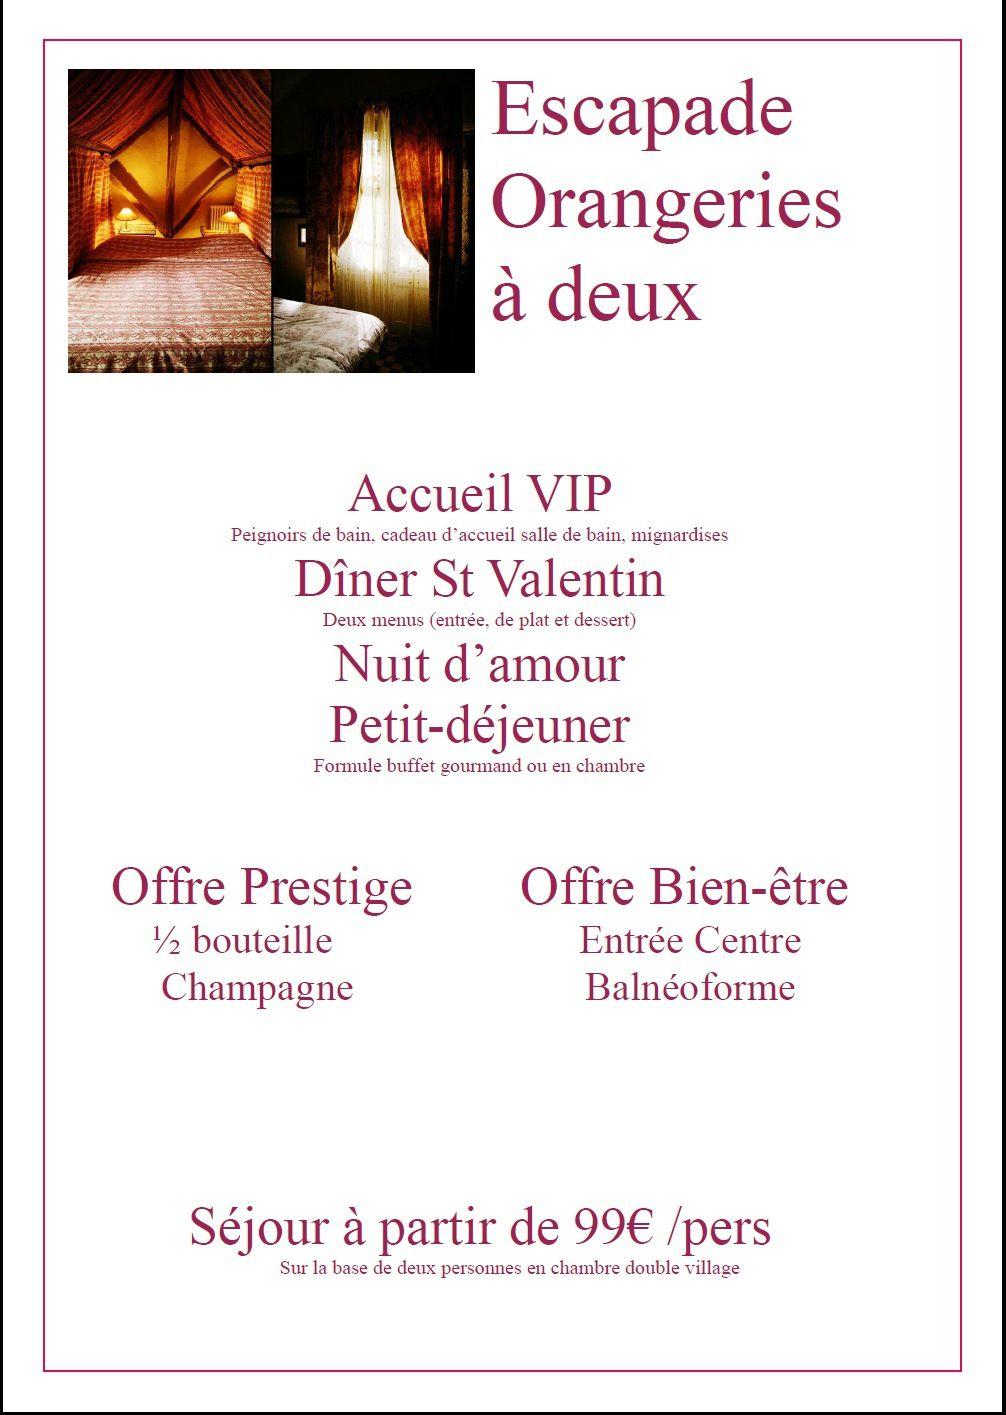 Escapade Saint-Valentin aux Orangeries